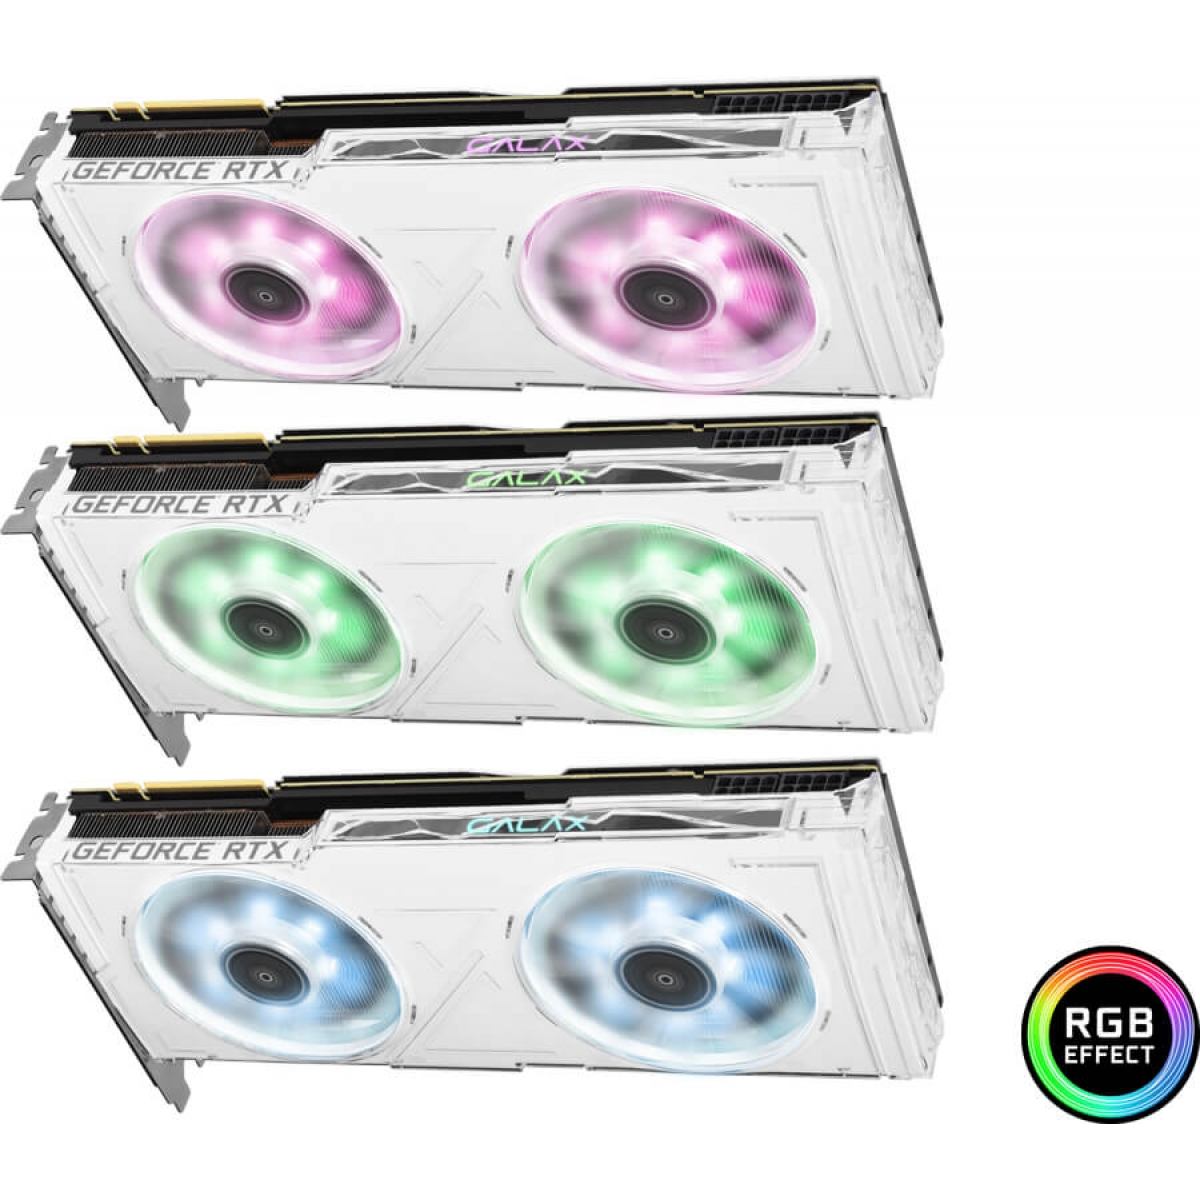 Placa de Vídeo Galax Geforce RTX 2080 Ti OC White Dual, 11GB GDDR6, 352Bit, 28IULBUCU4KW